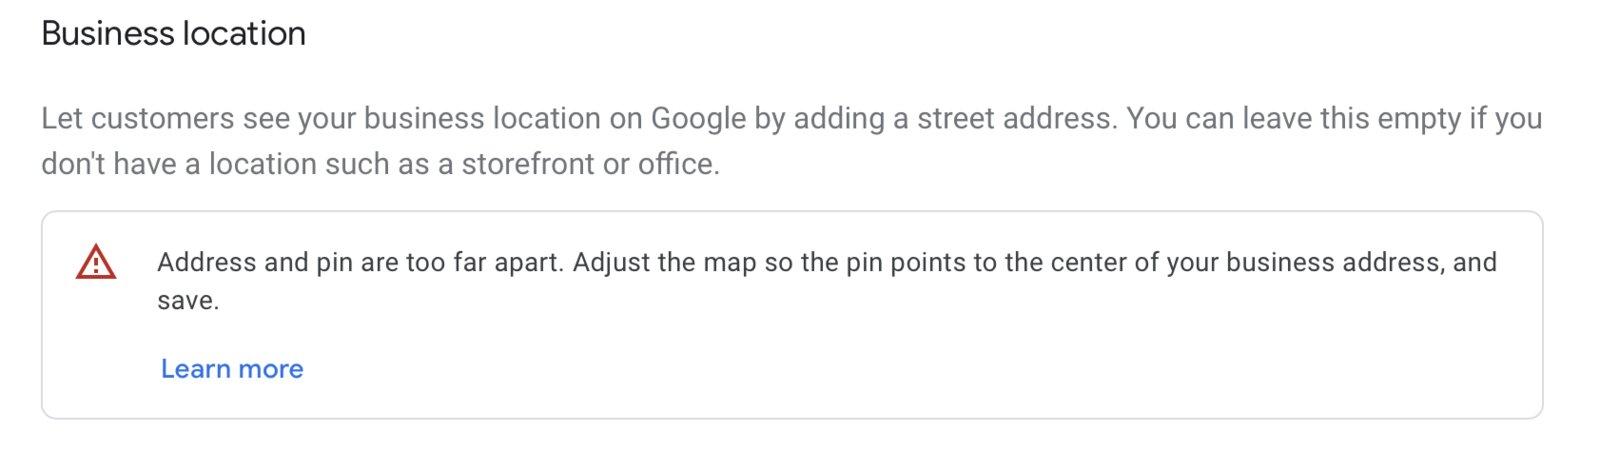 GMB Pin Issue Screenshot.jpg